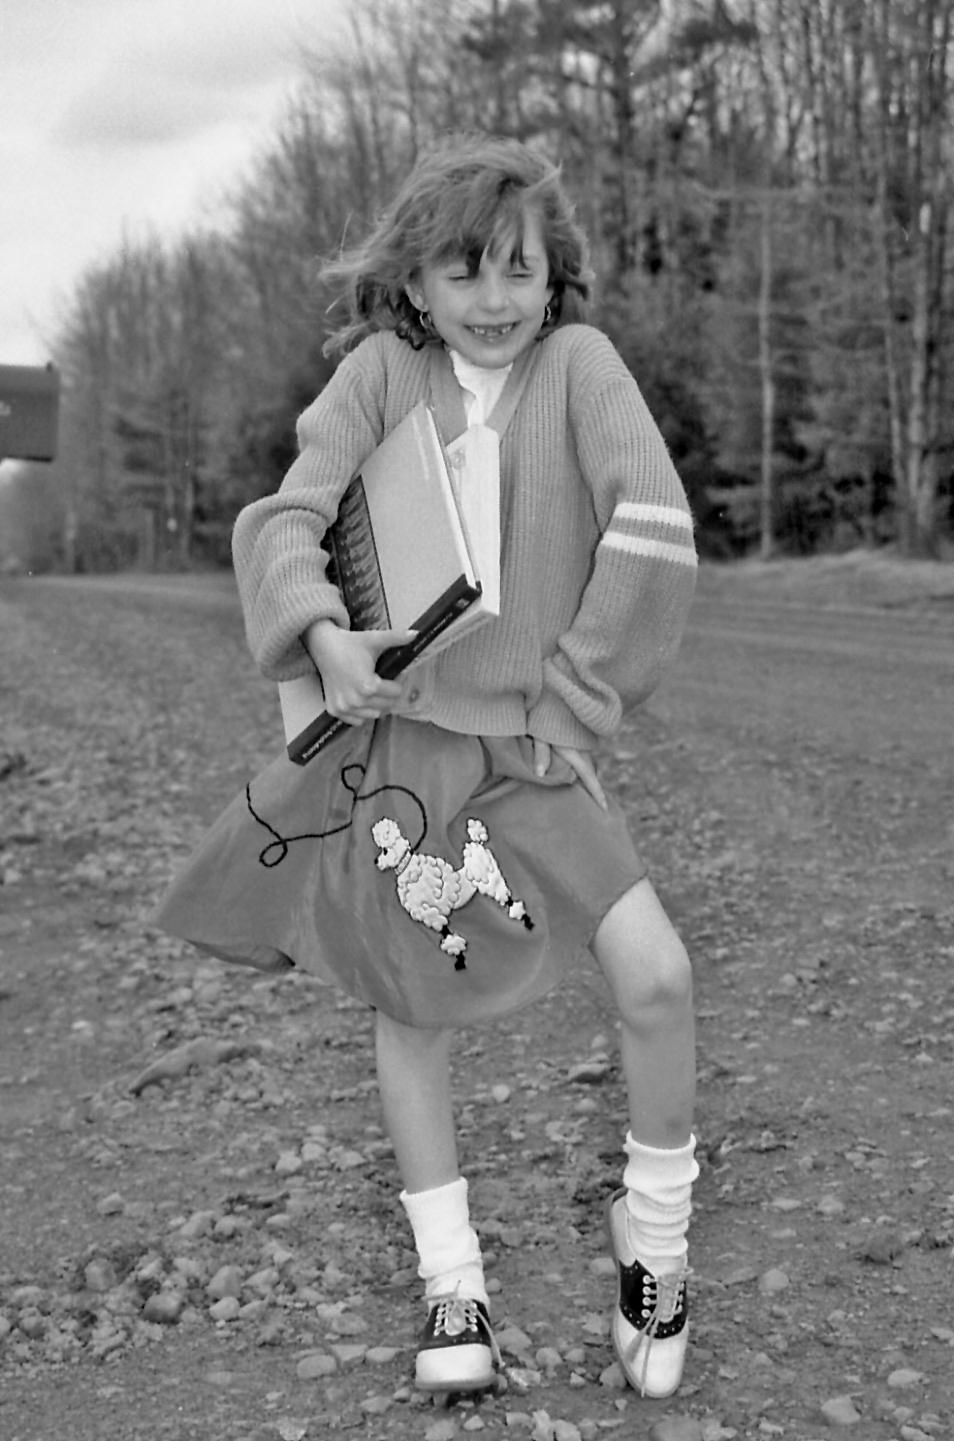 FileGirl Wearing Poodle Skirt